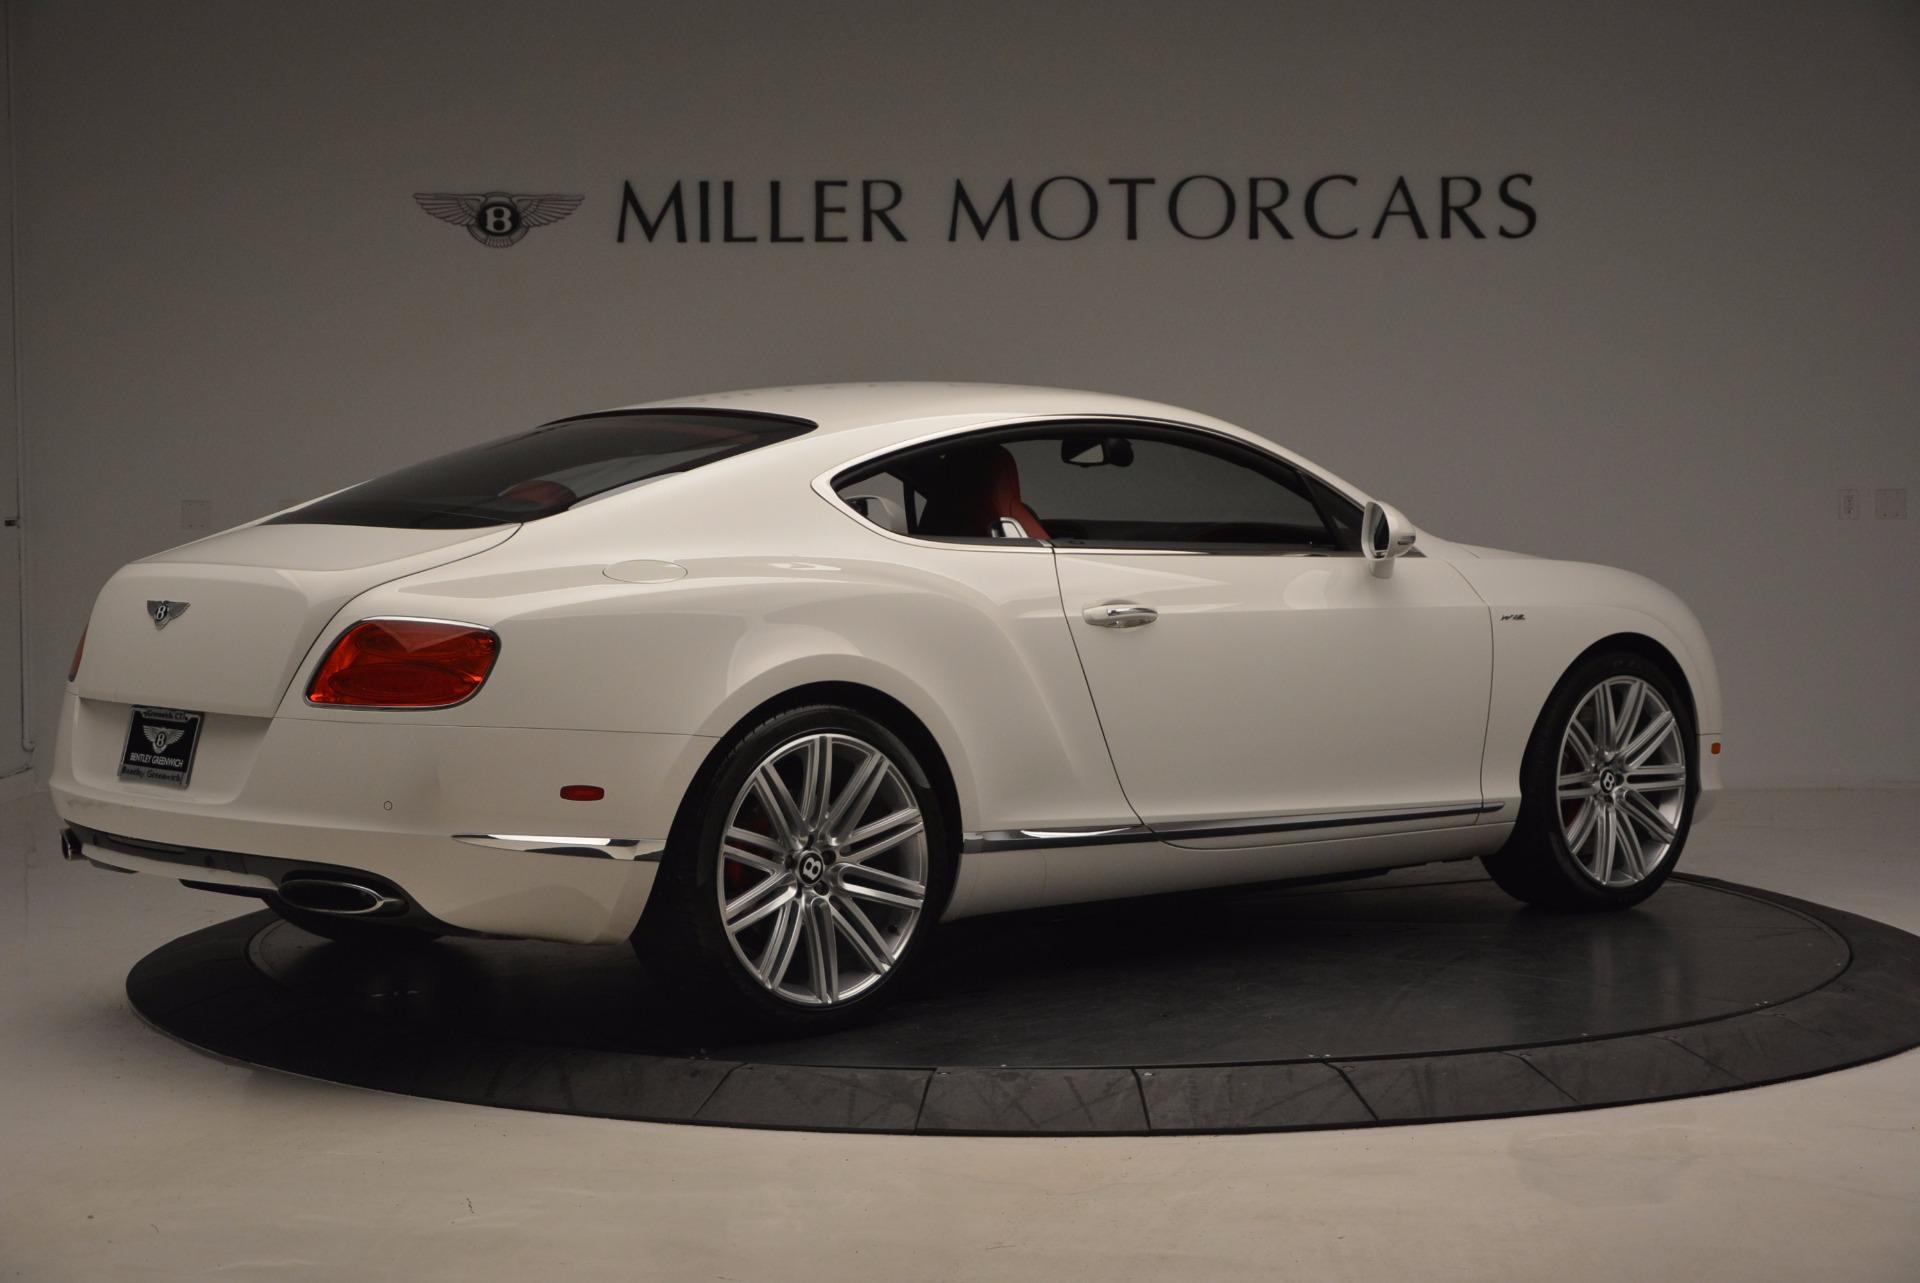 Used 2014 Bentley Continental GT Speed For Sale In Westport, CT 1102_p9